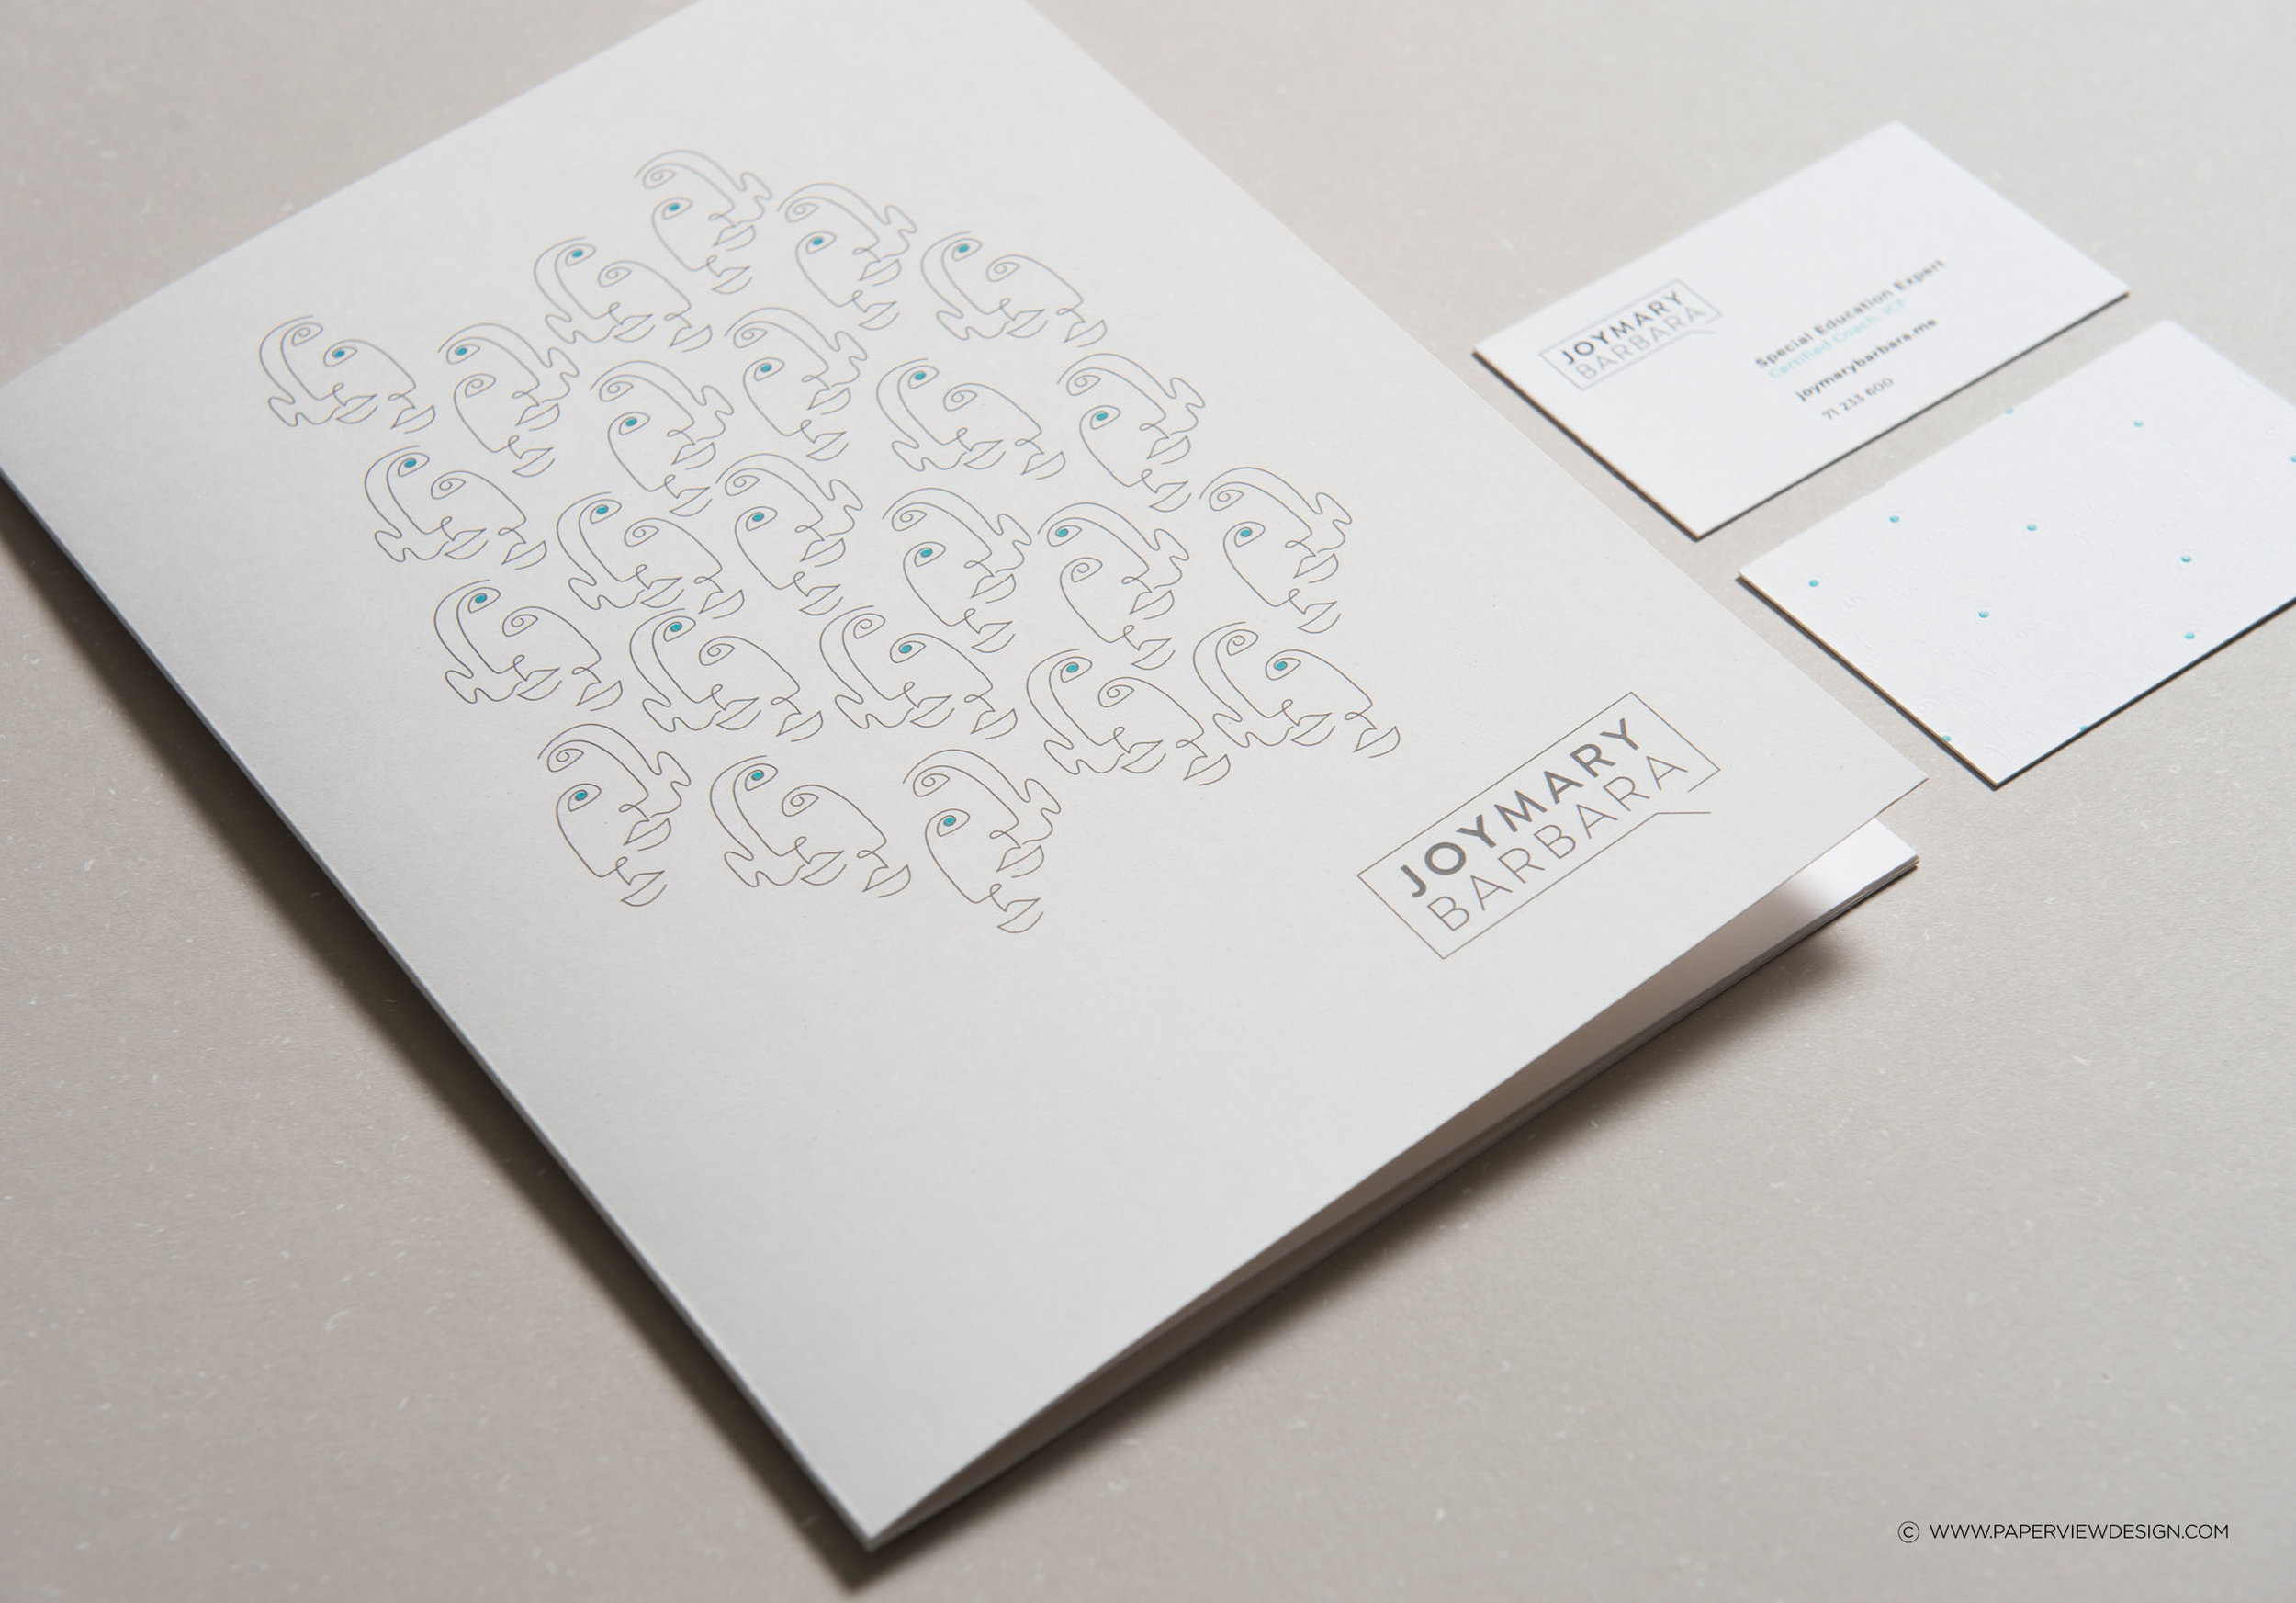 Joy-Mary-Barbara-Life-Coach-Identity-Business-Card-Note-Book